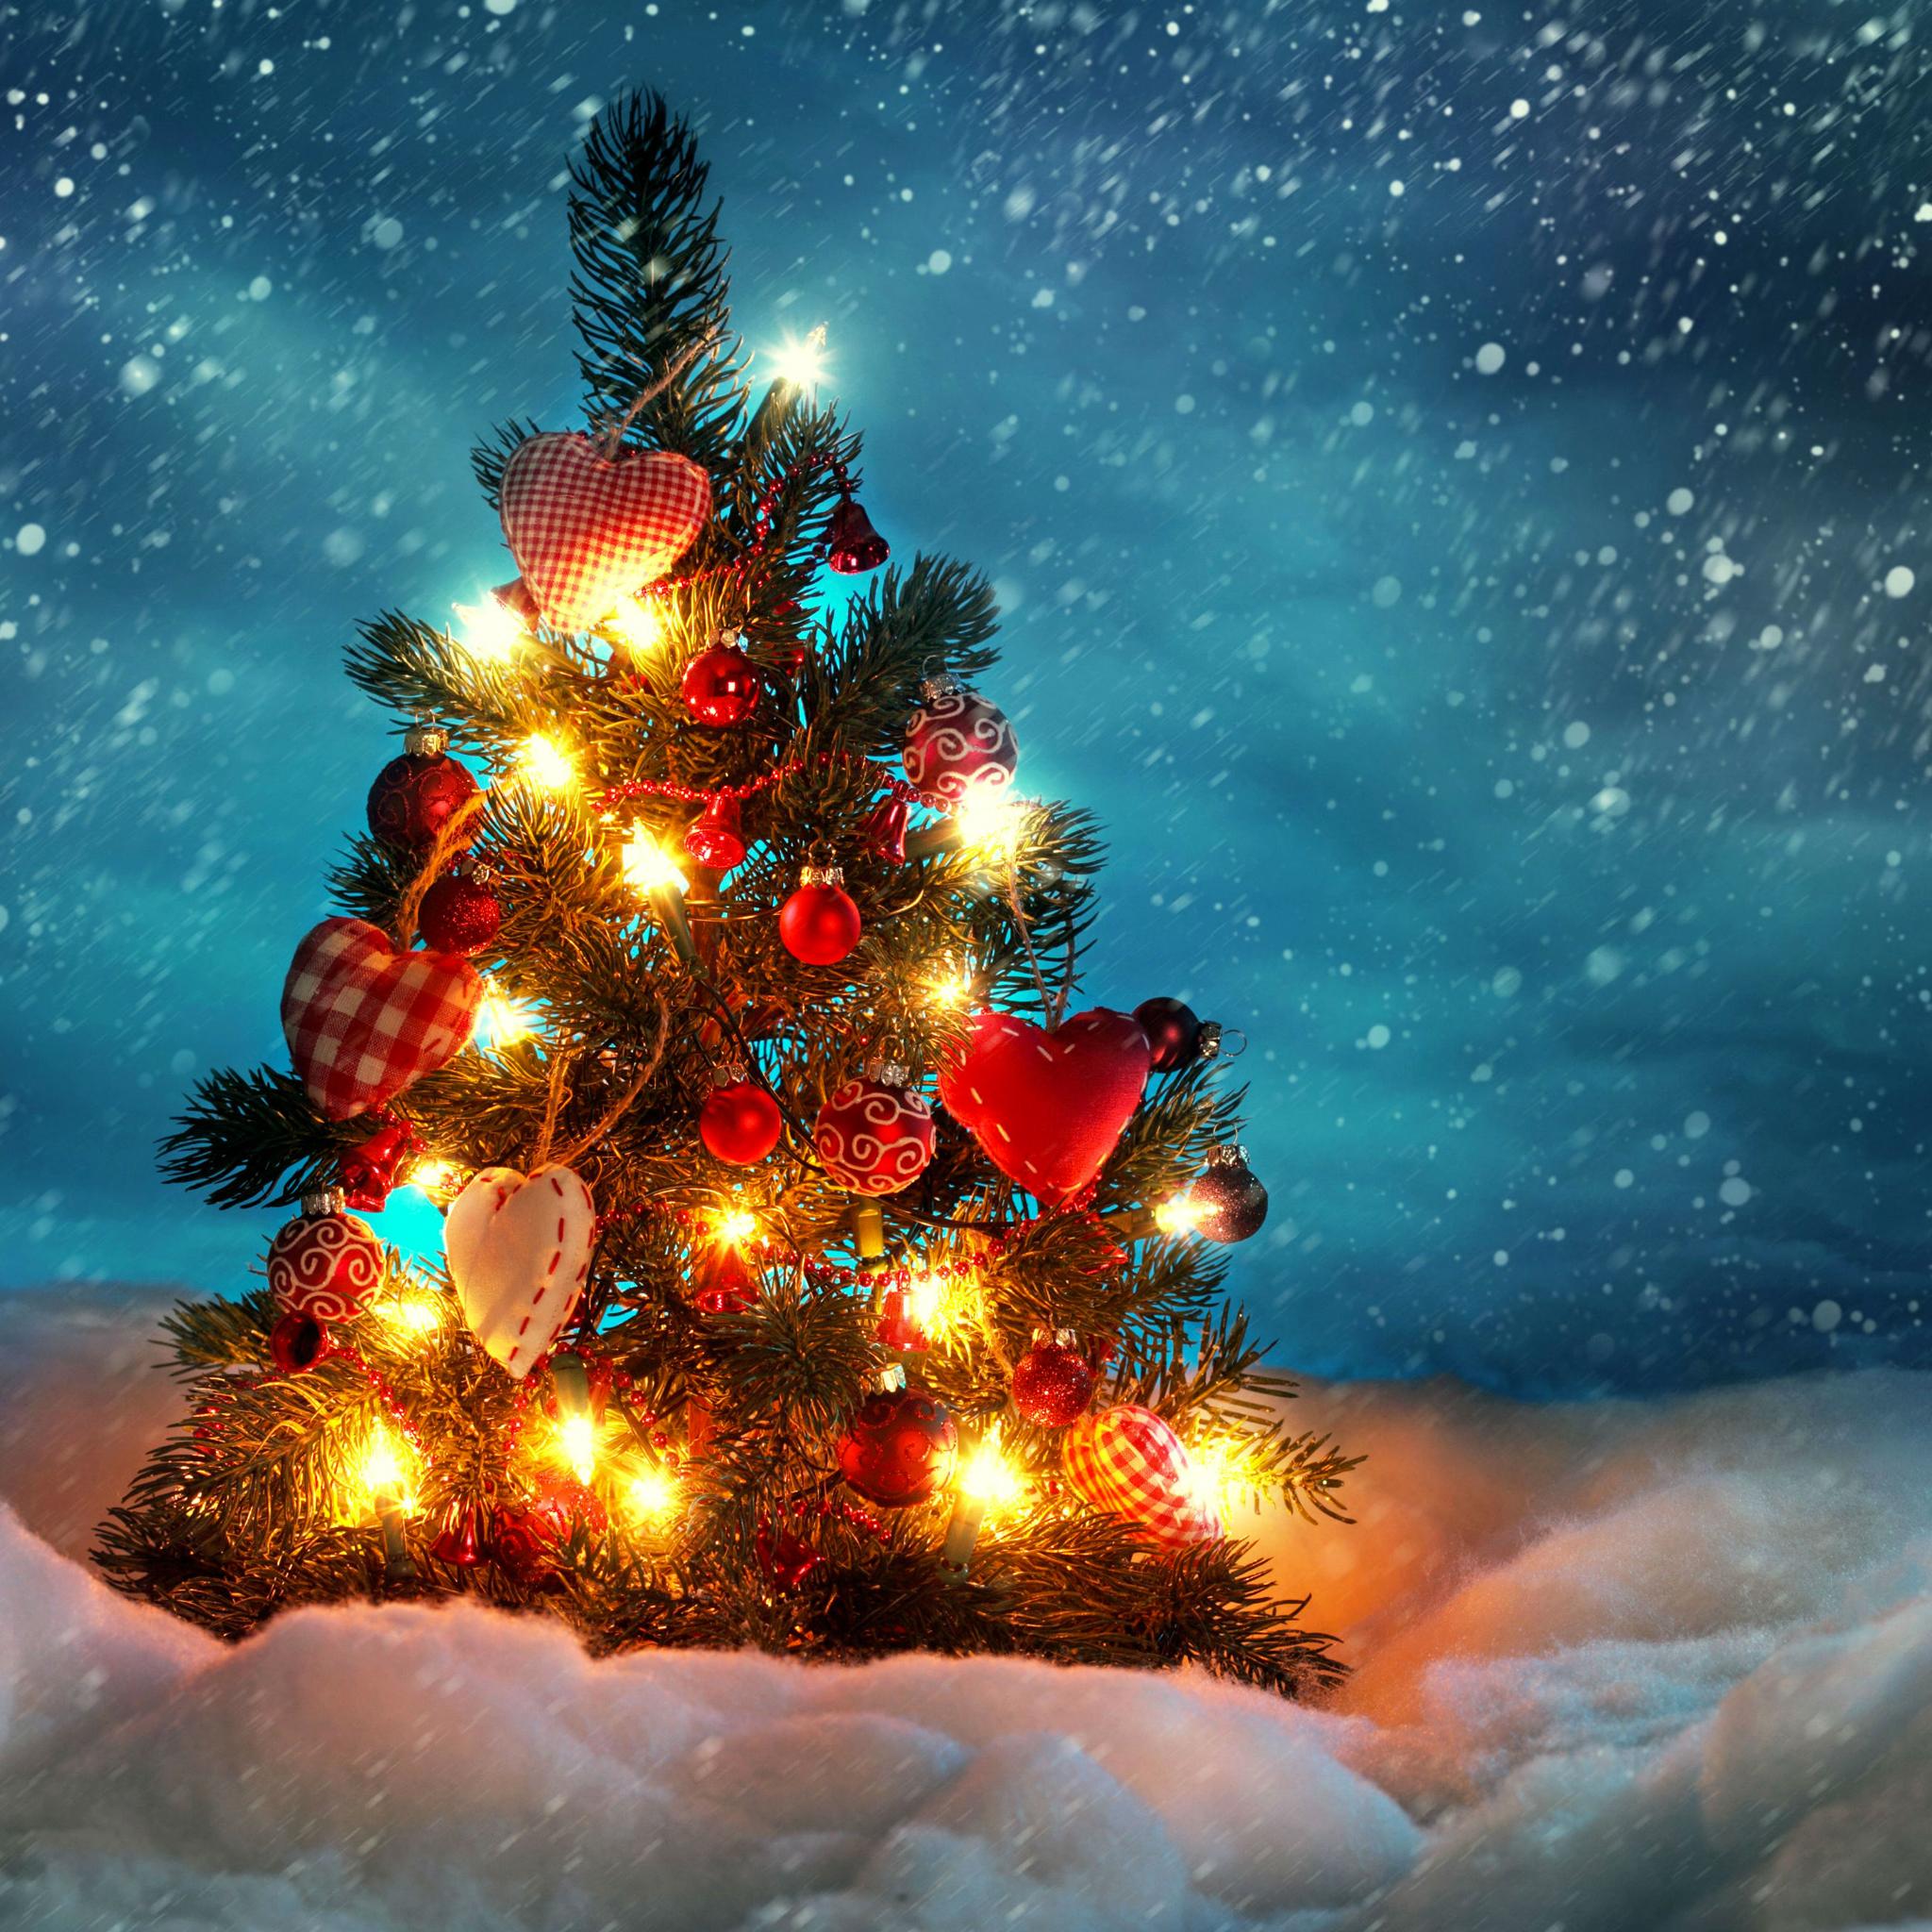 Christmas-Tree-3Wallpapers-iPad-Retina